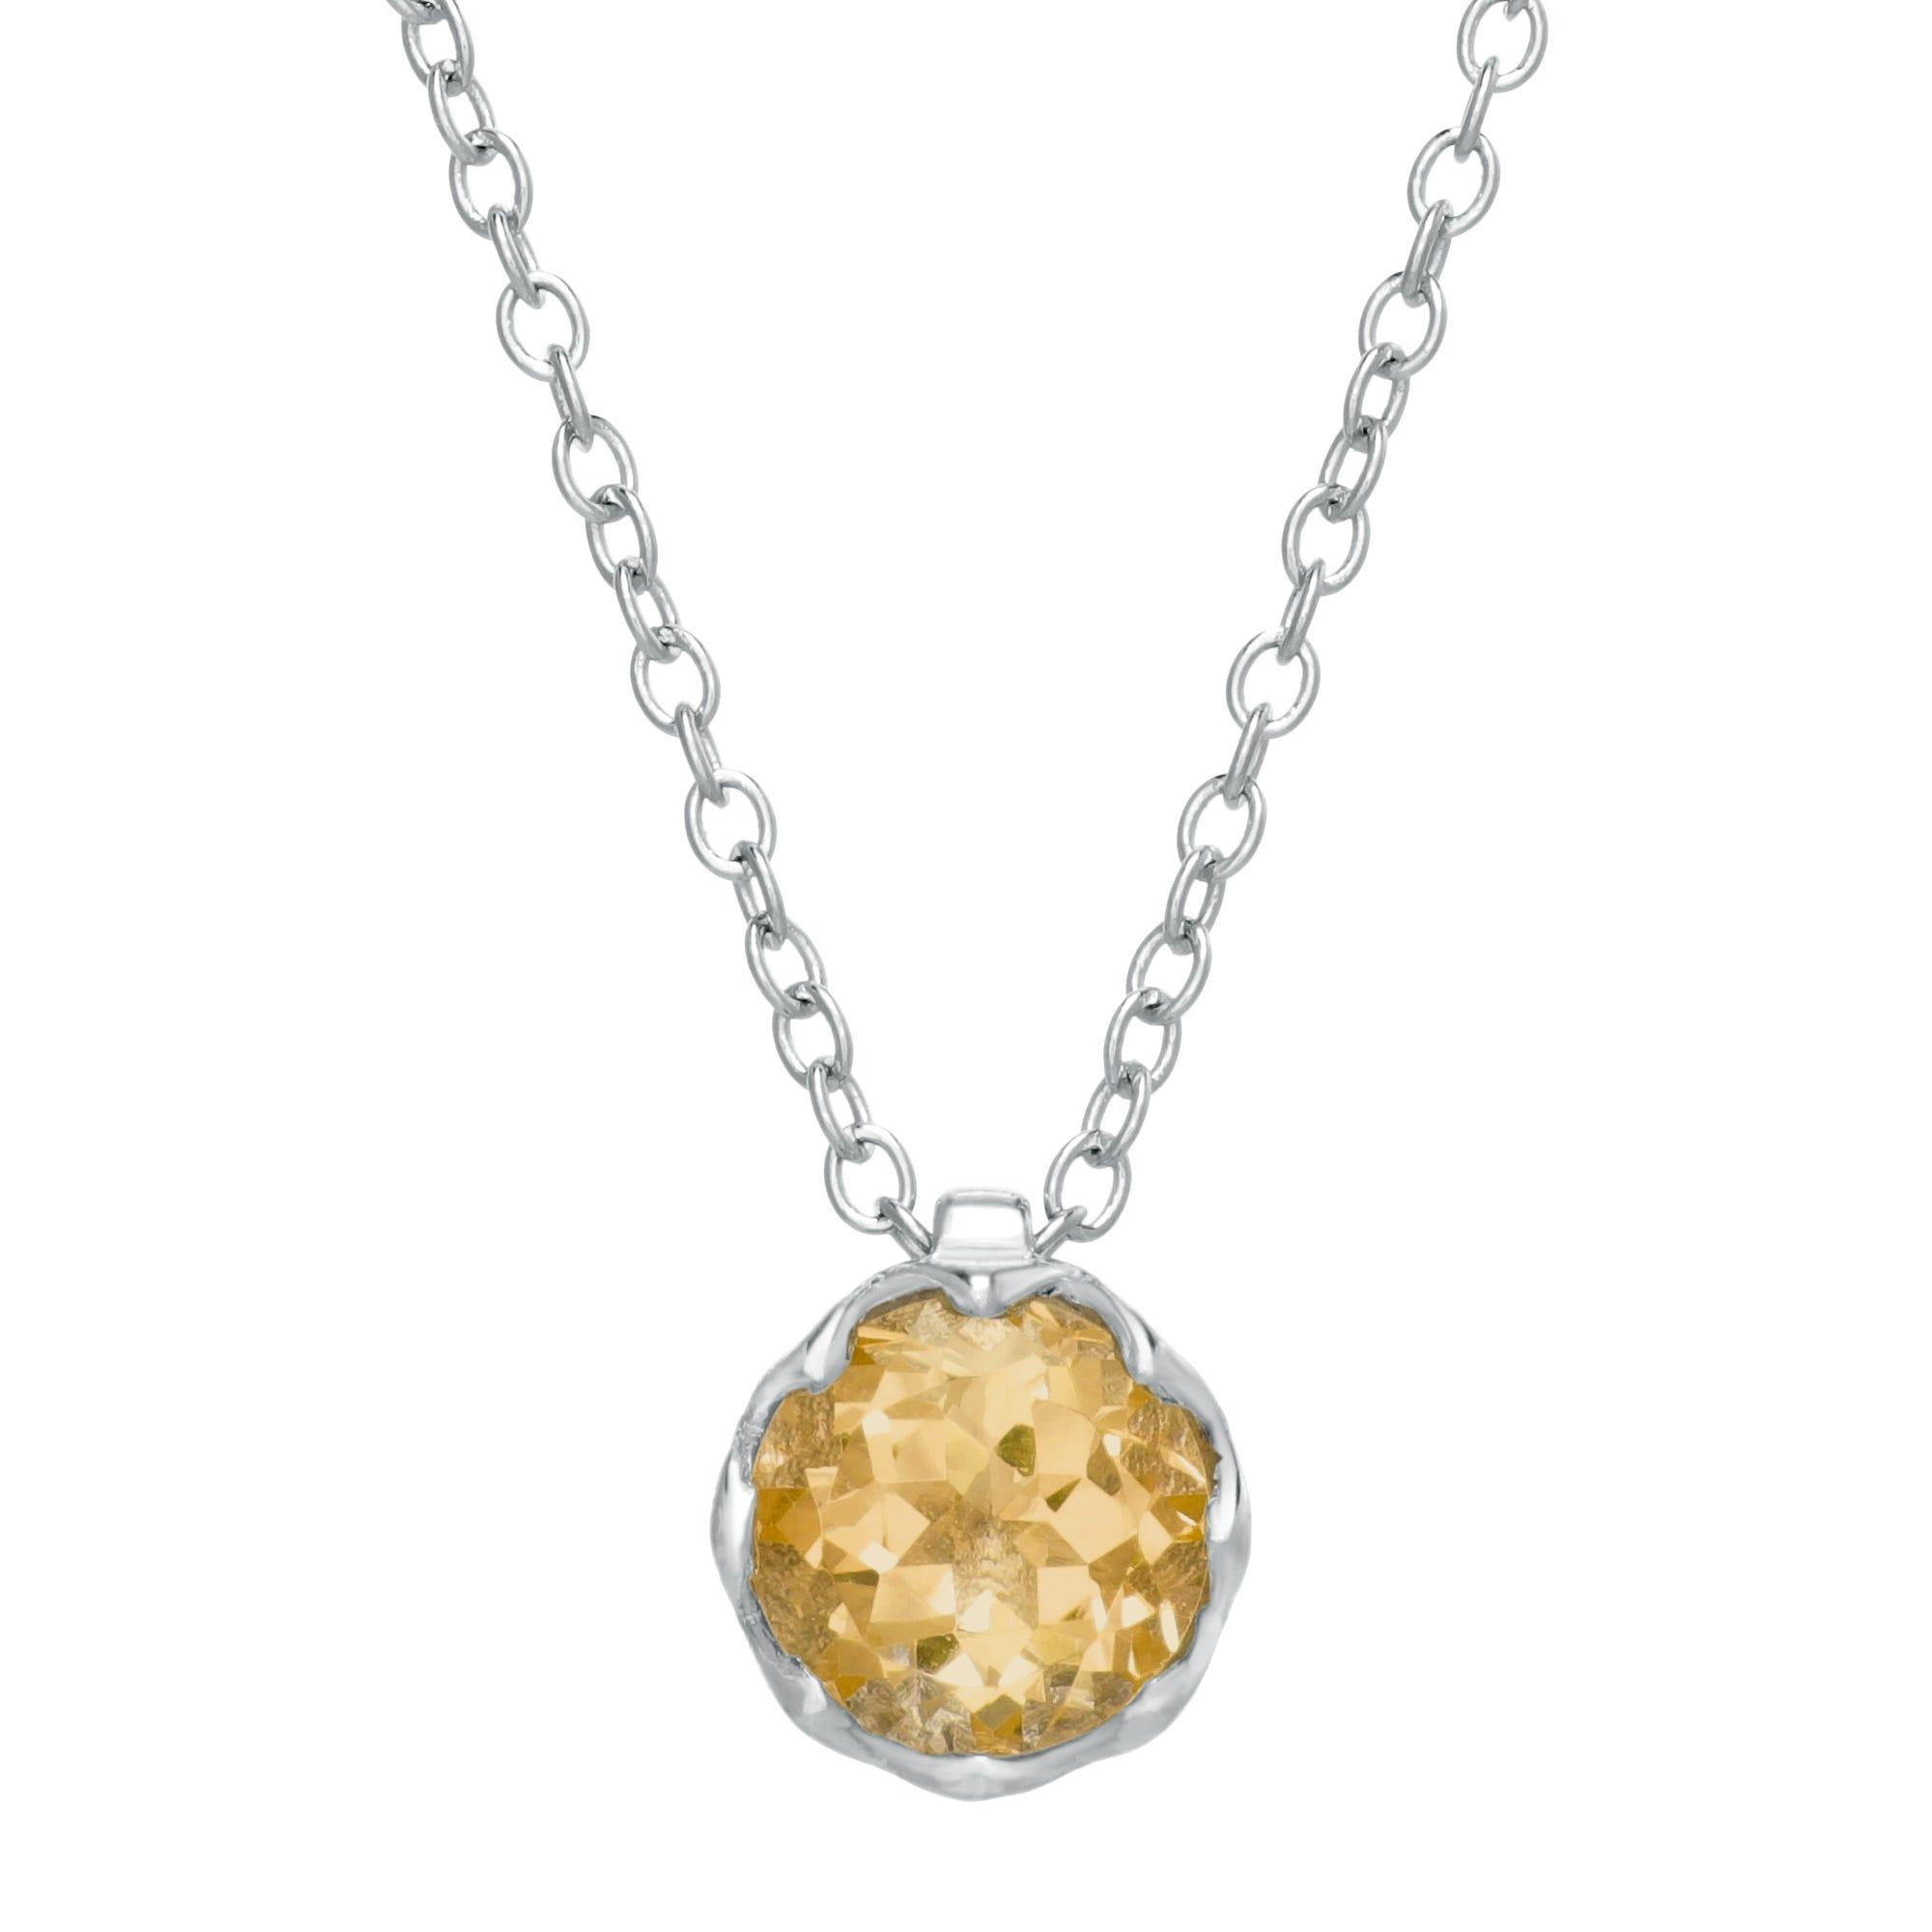 Round Citrine Gemstone Pendant in Sterling Silver